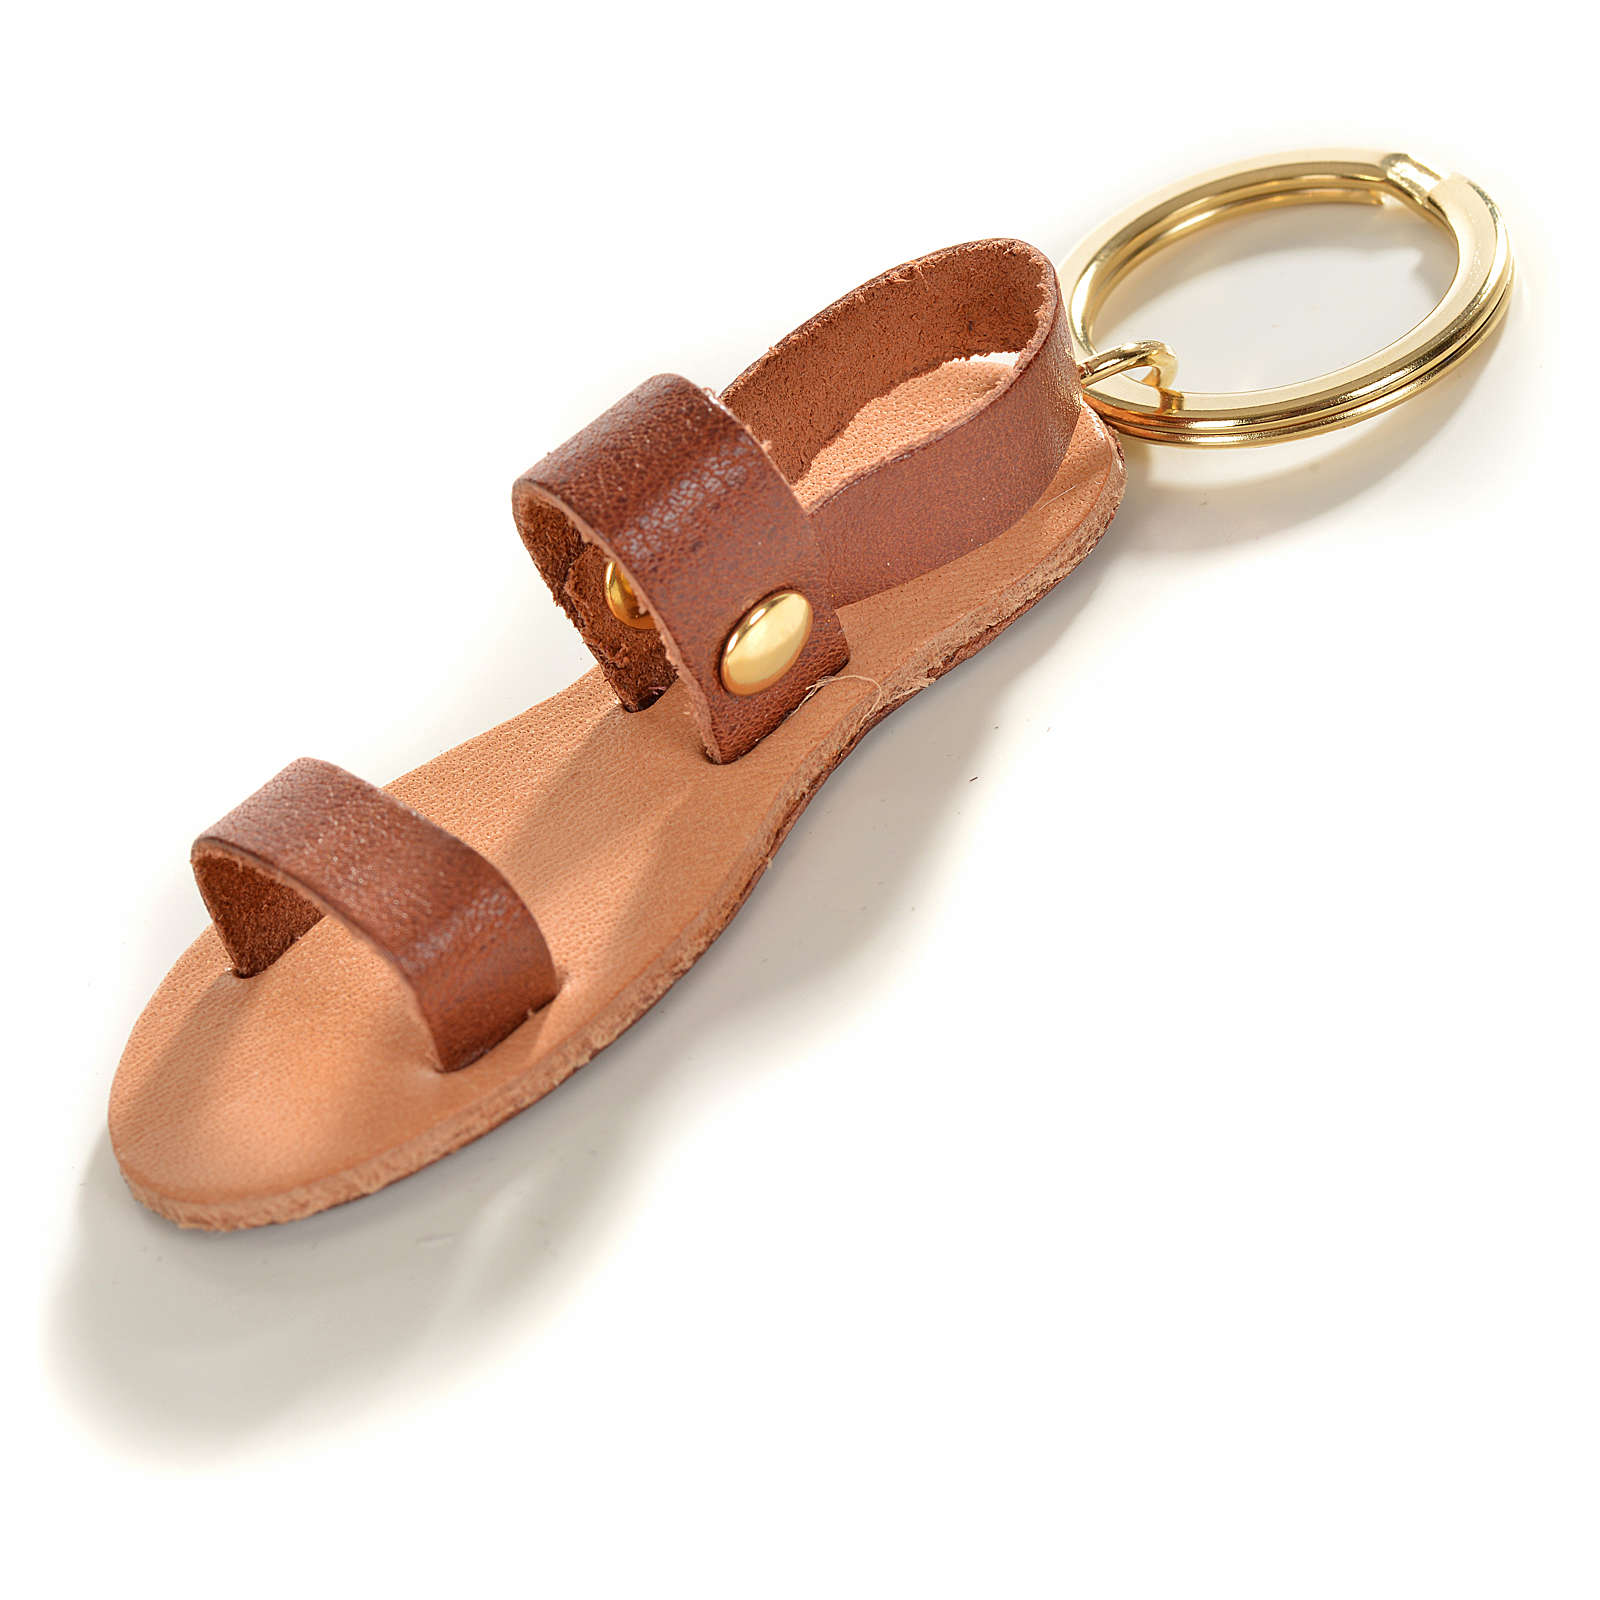 Chaveiro sandália franciscana couro verdadeiro 3